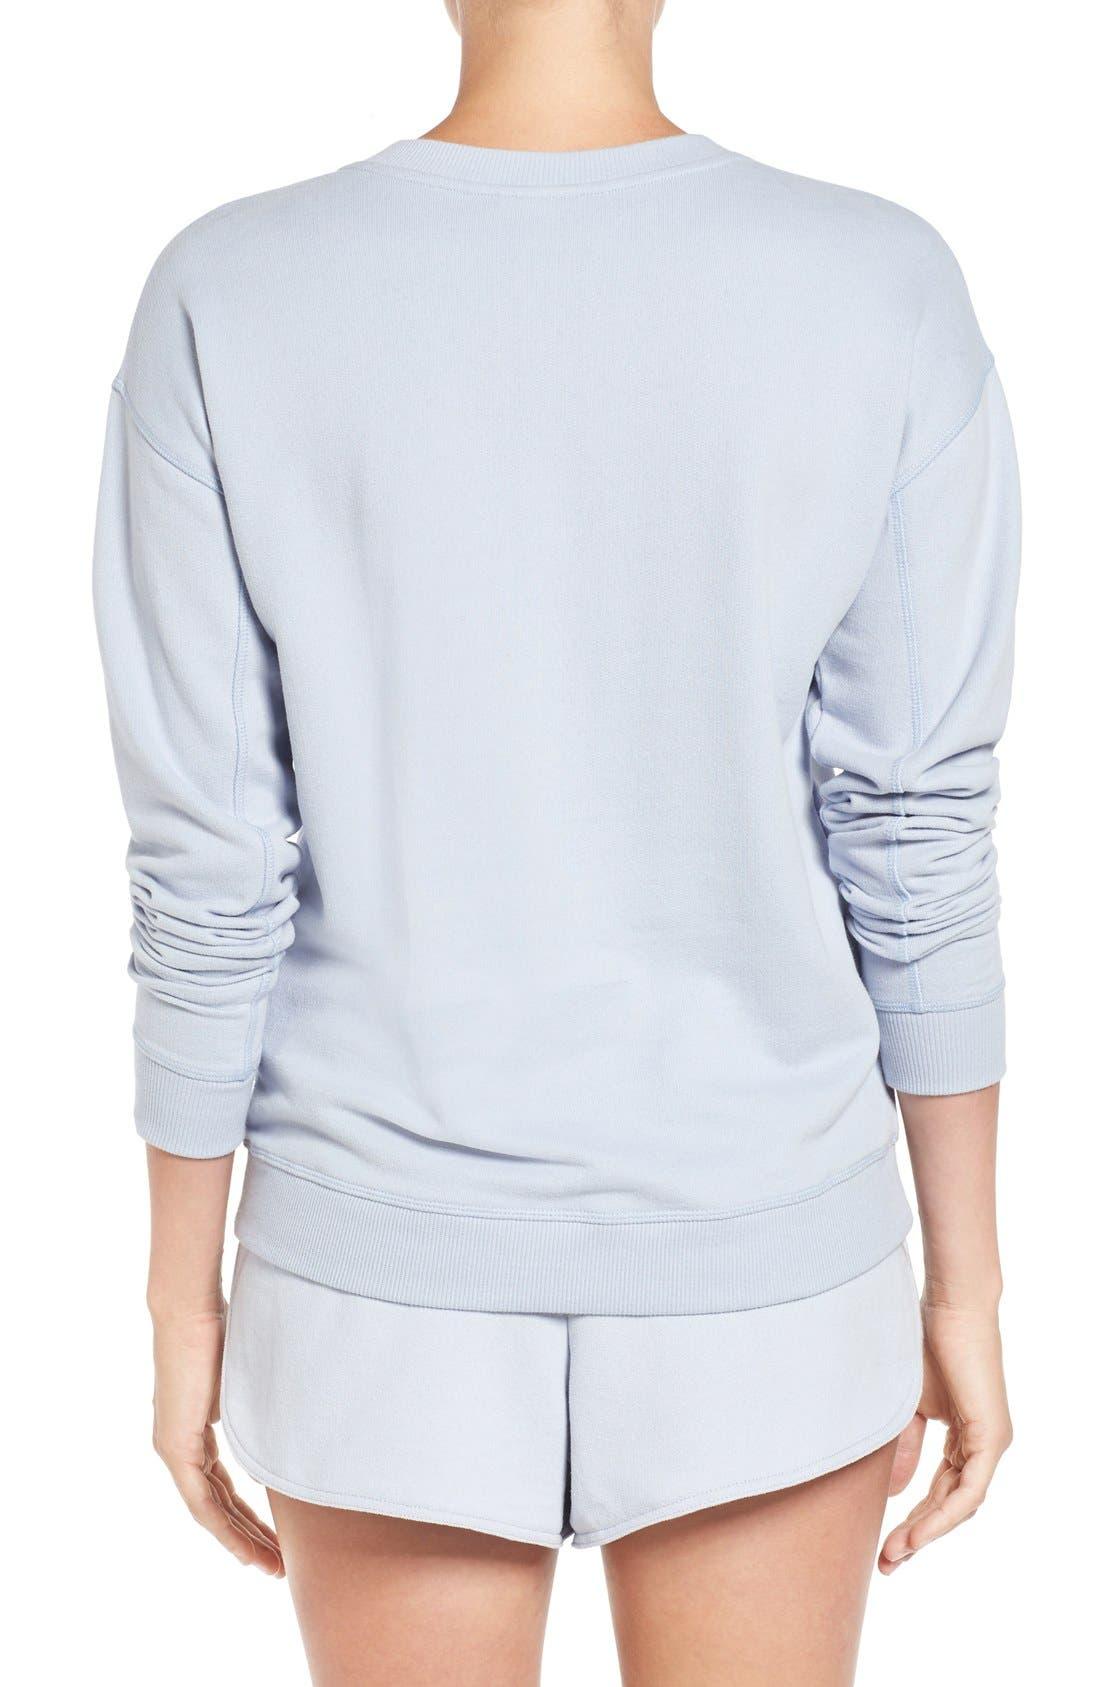 Alternate Image 2  - IVY PARK® Logo Peached Sweatshirt